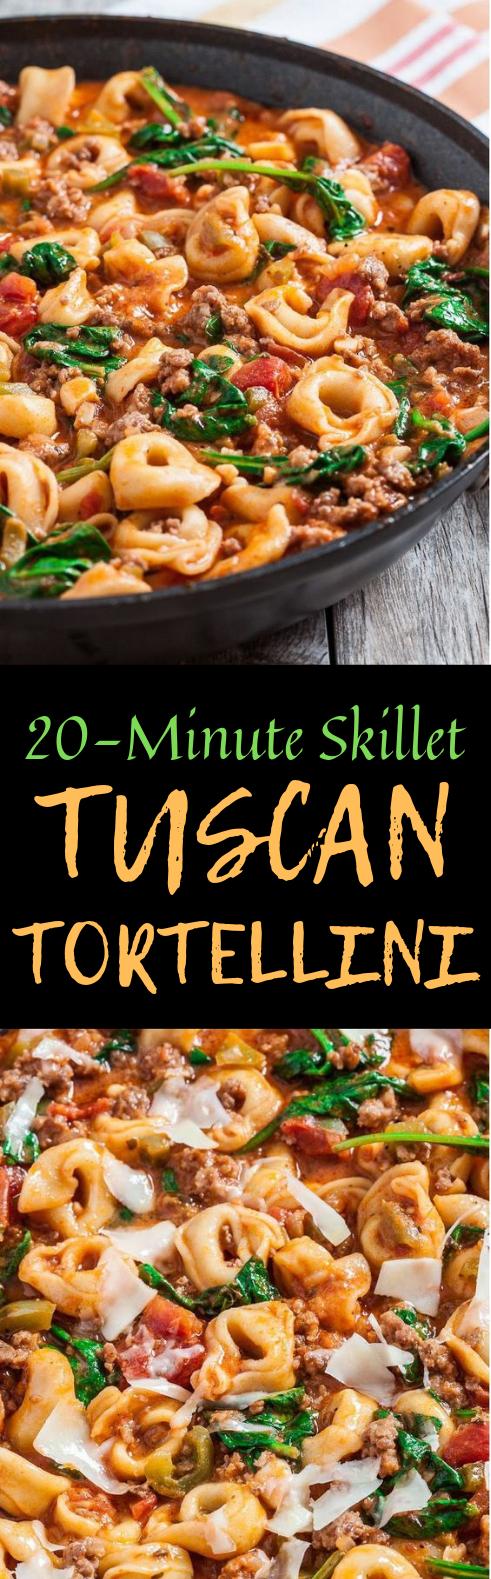 20-MINUTE SKILLET TUSCAN TORTELLINI #weeknightdinner #Tortellini